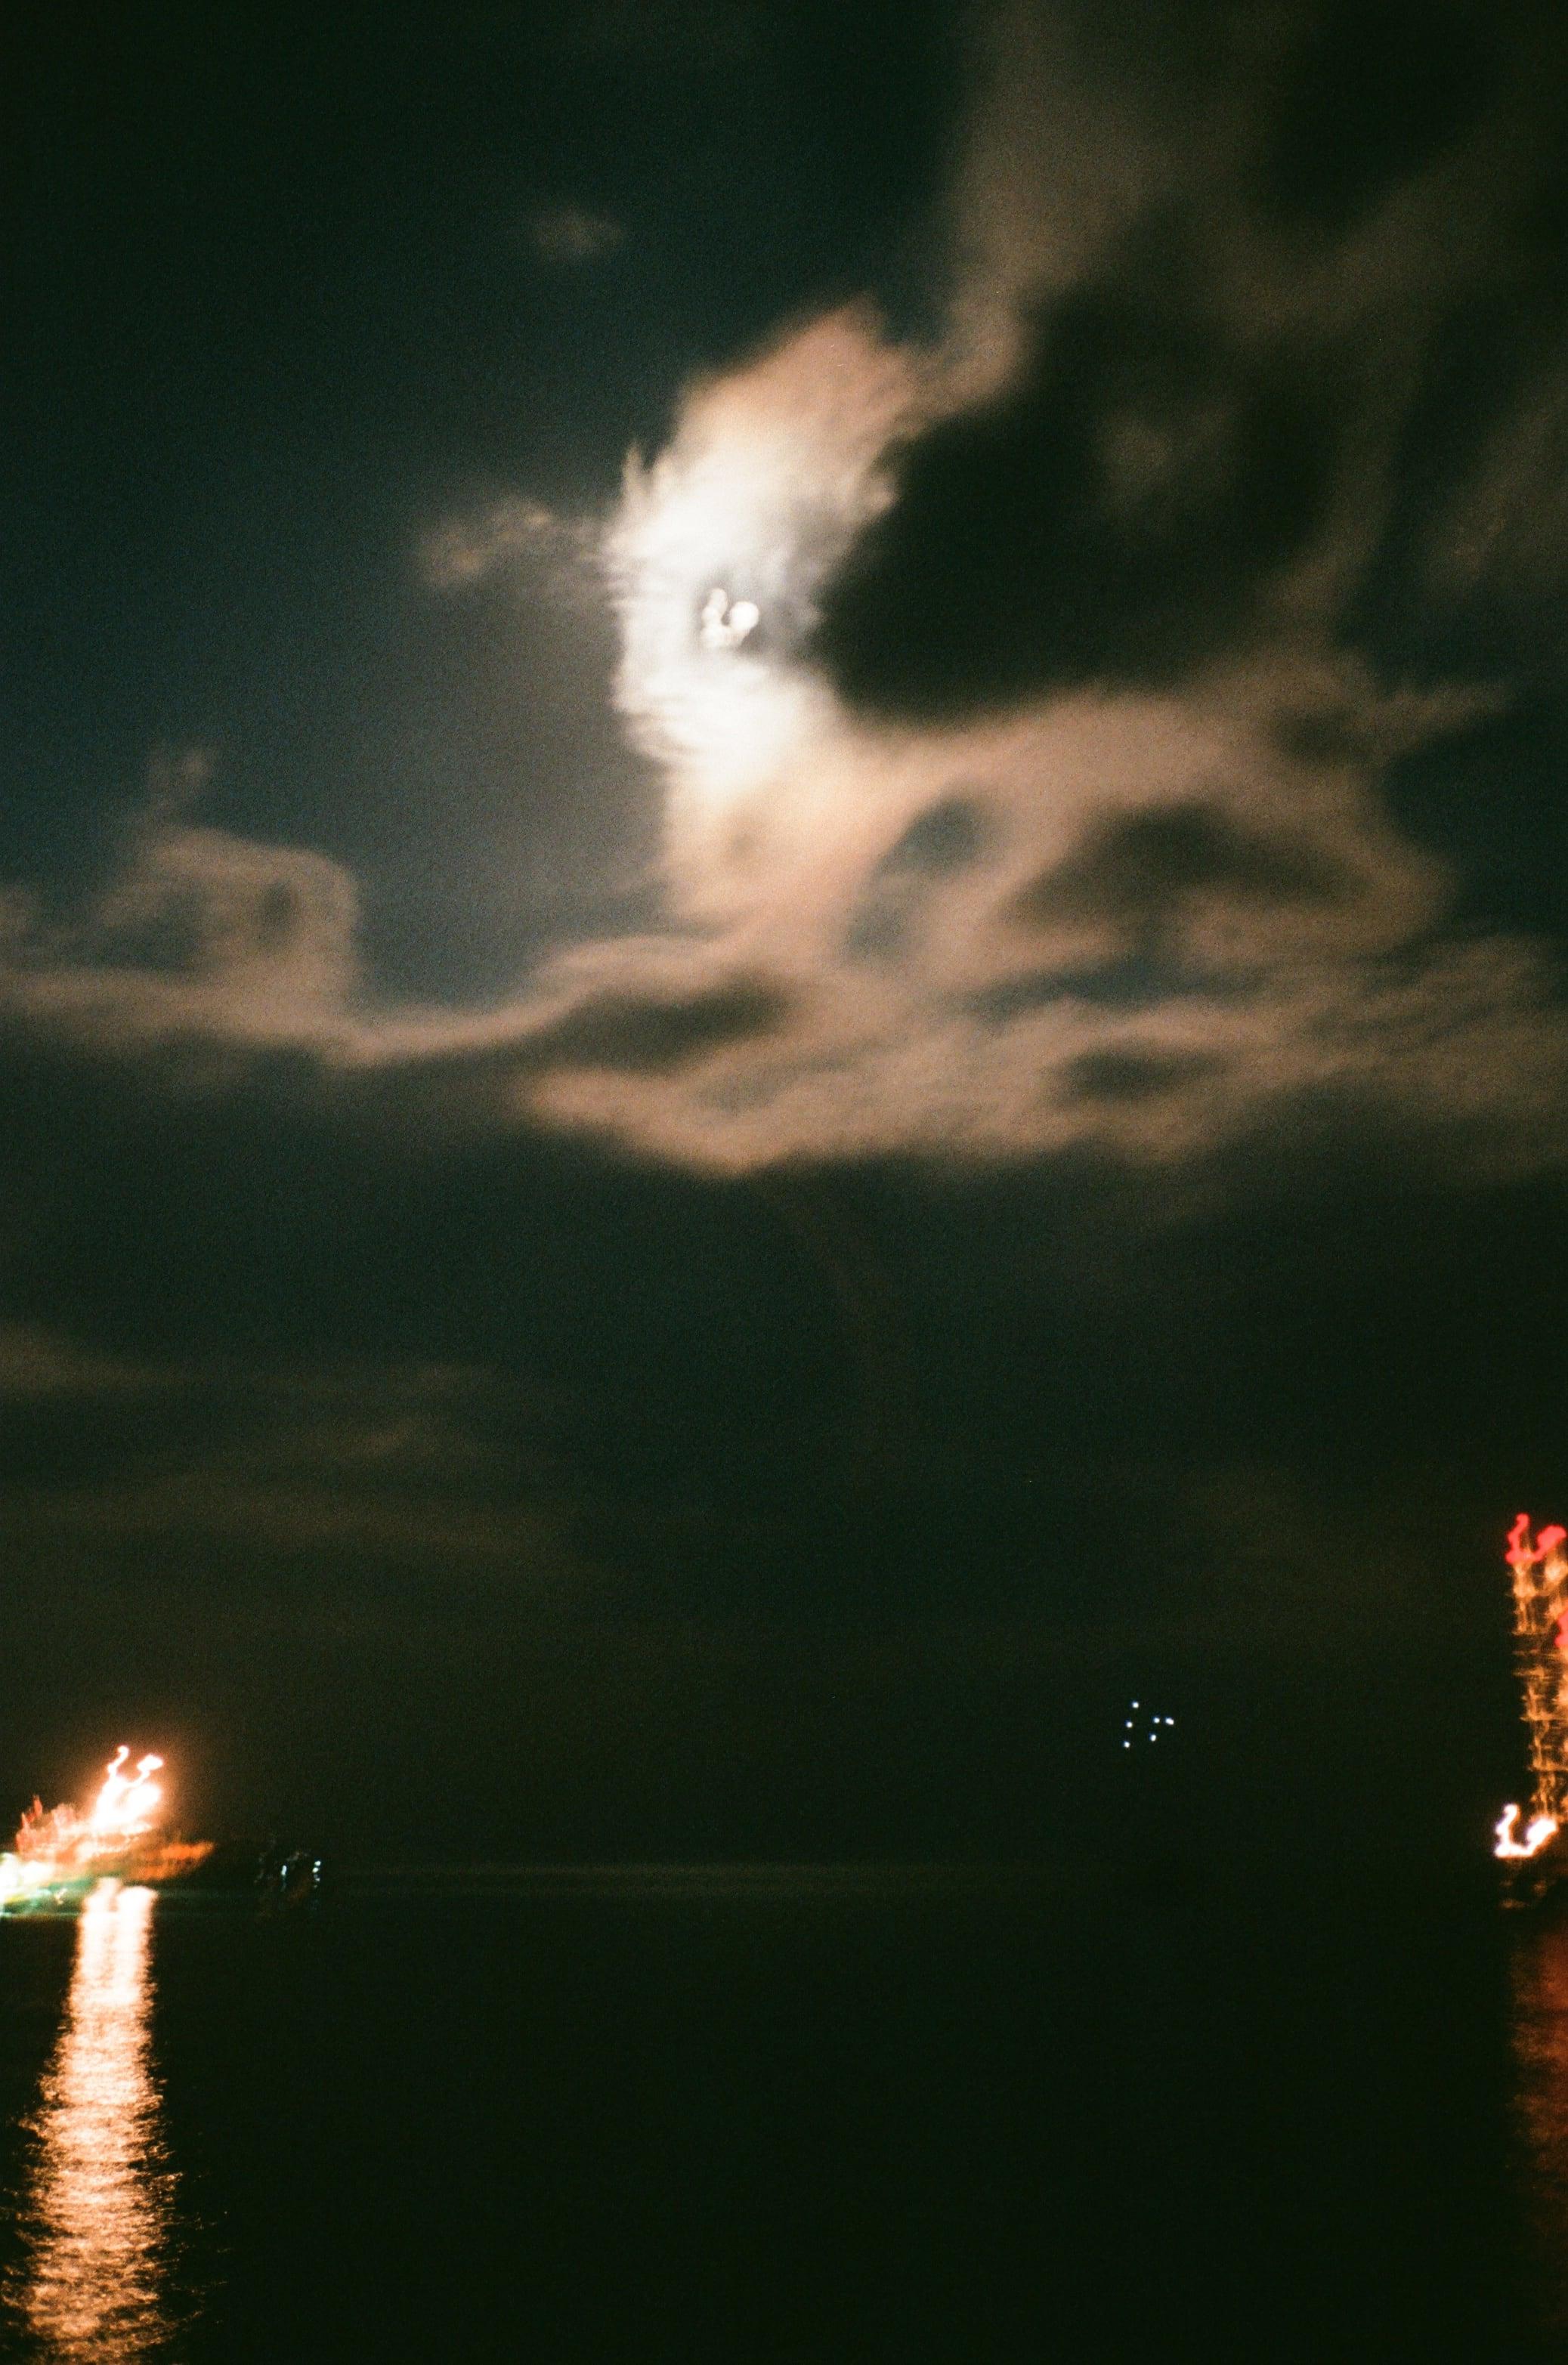 0016ChristosVourlis_photography_CVHAIR_CVDIARY_personal diary__film_35mm__15.jpg